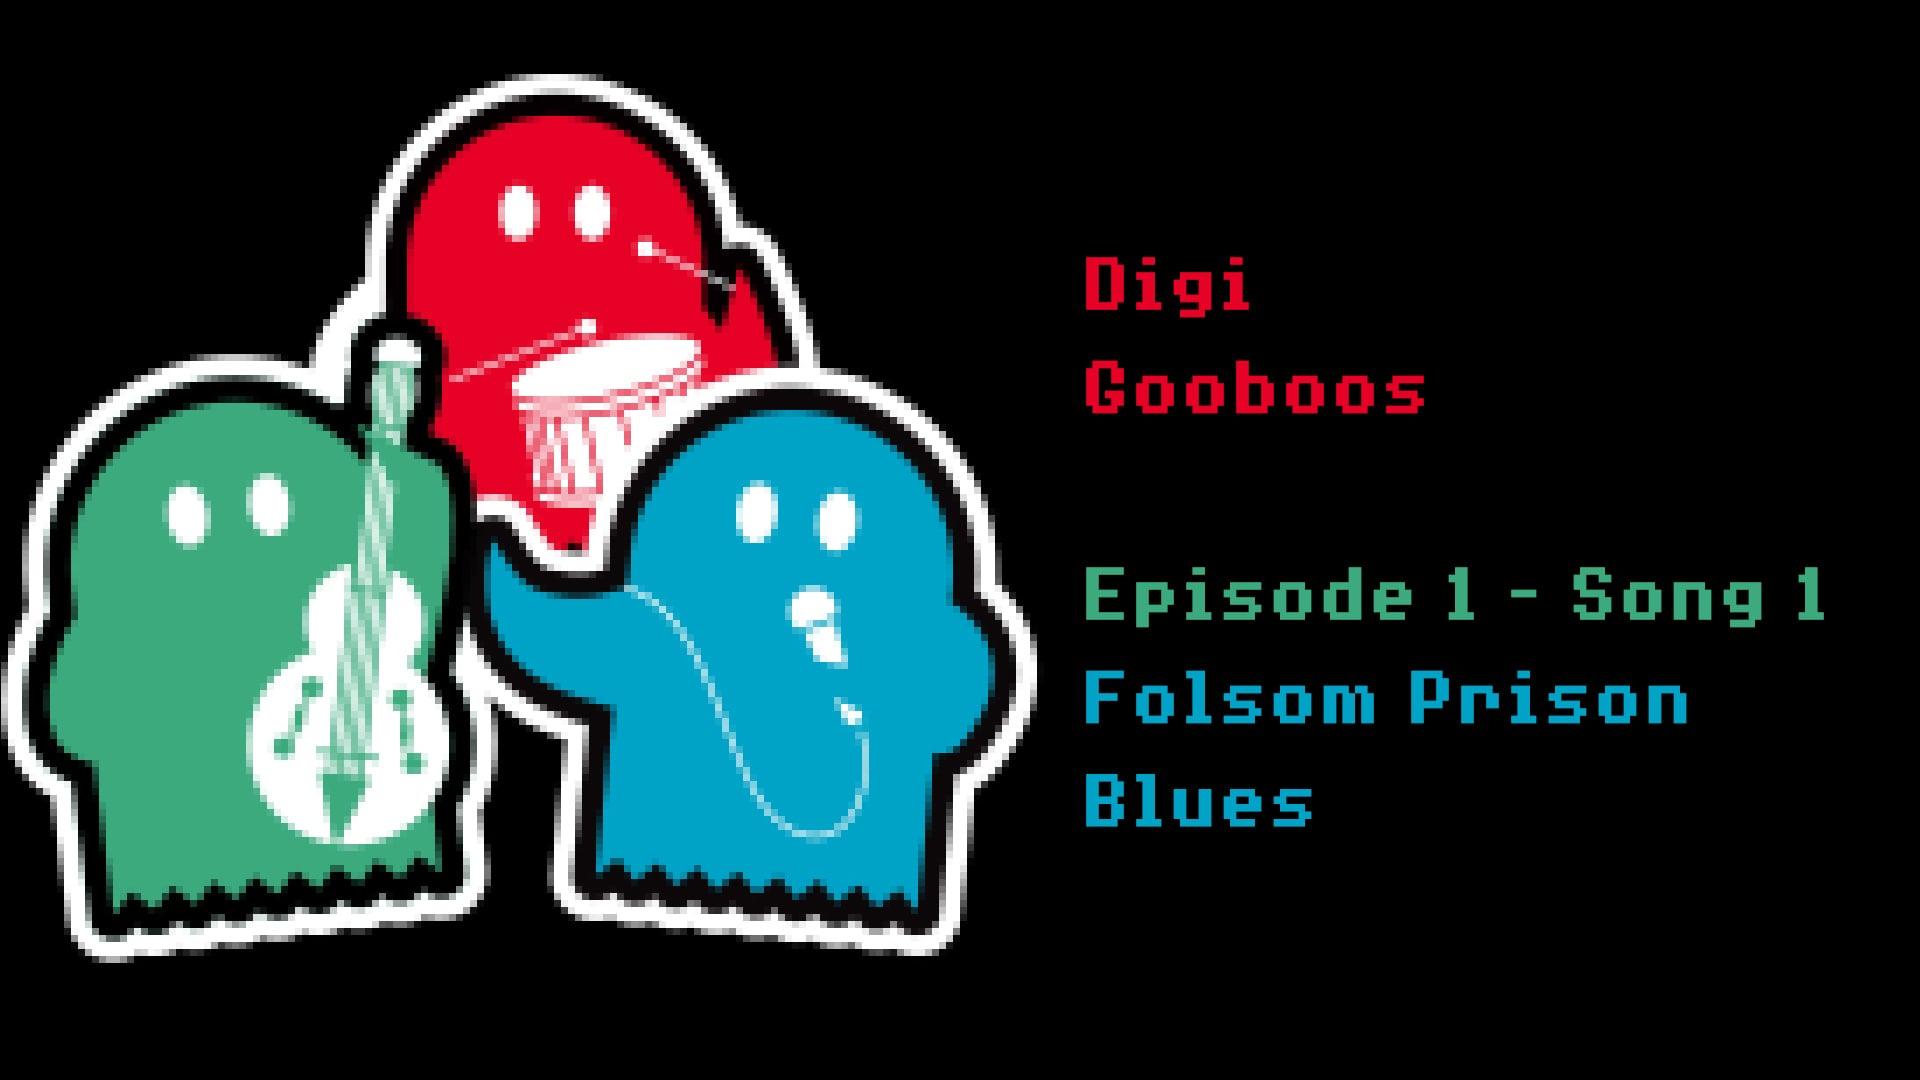 Digi GooBoos Song 1 - Folsom Prison Blues